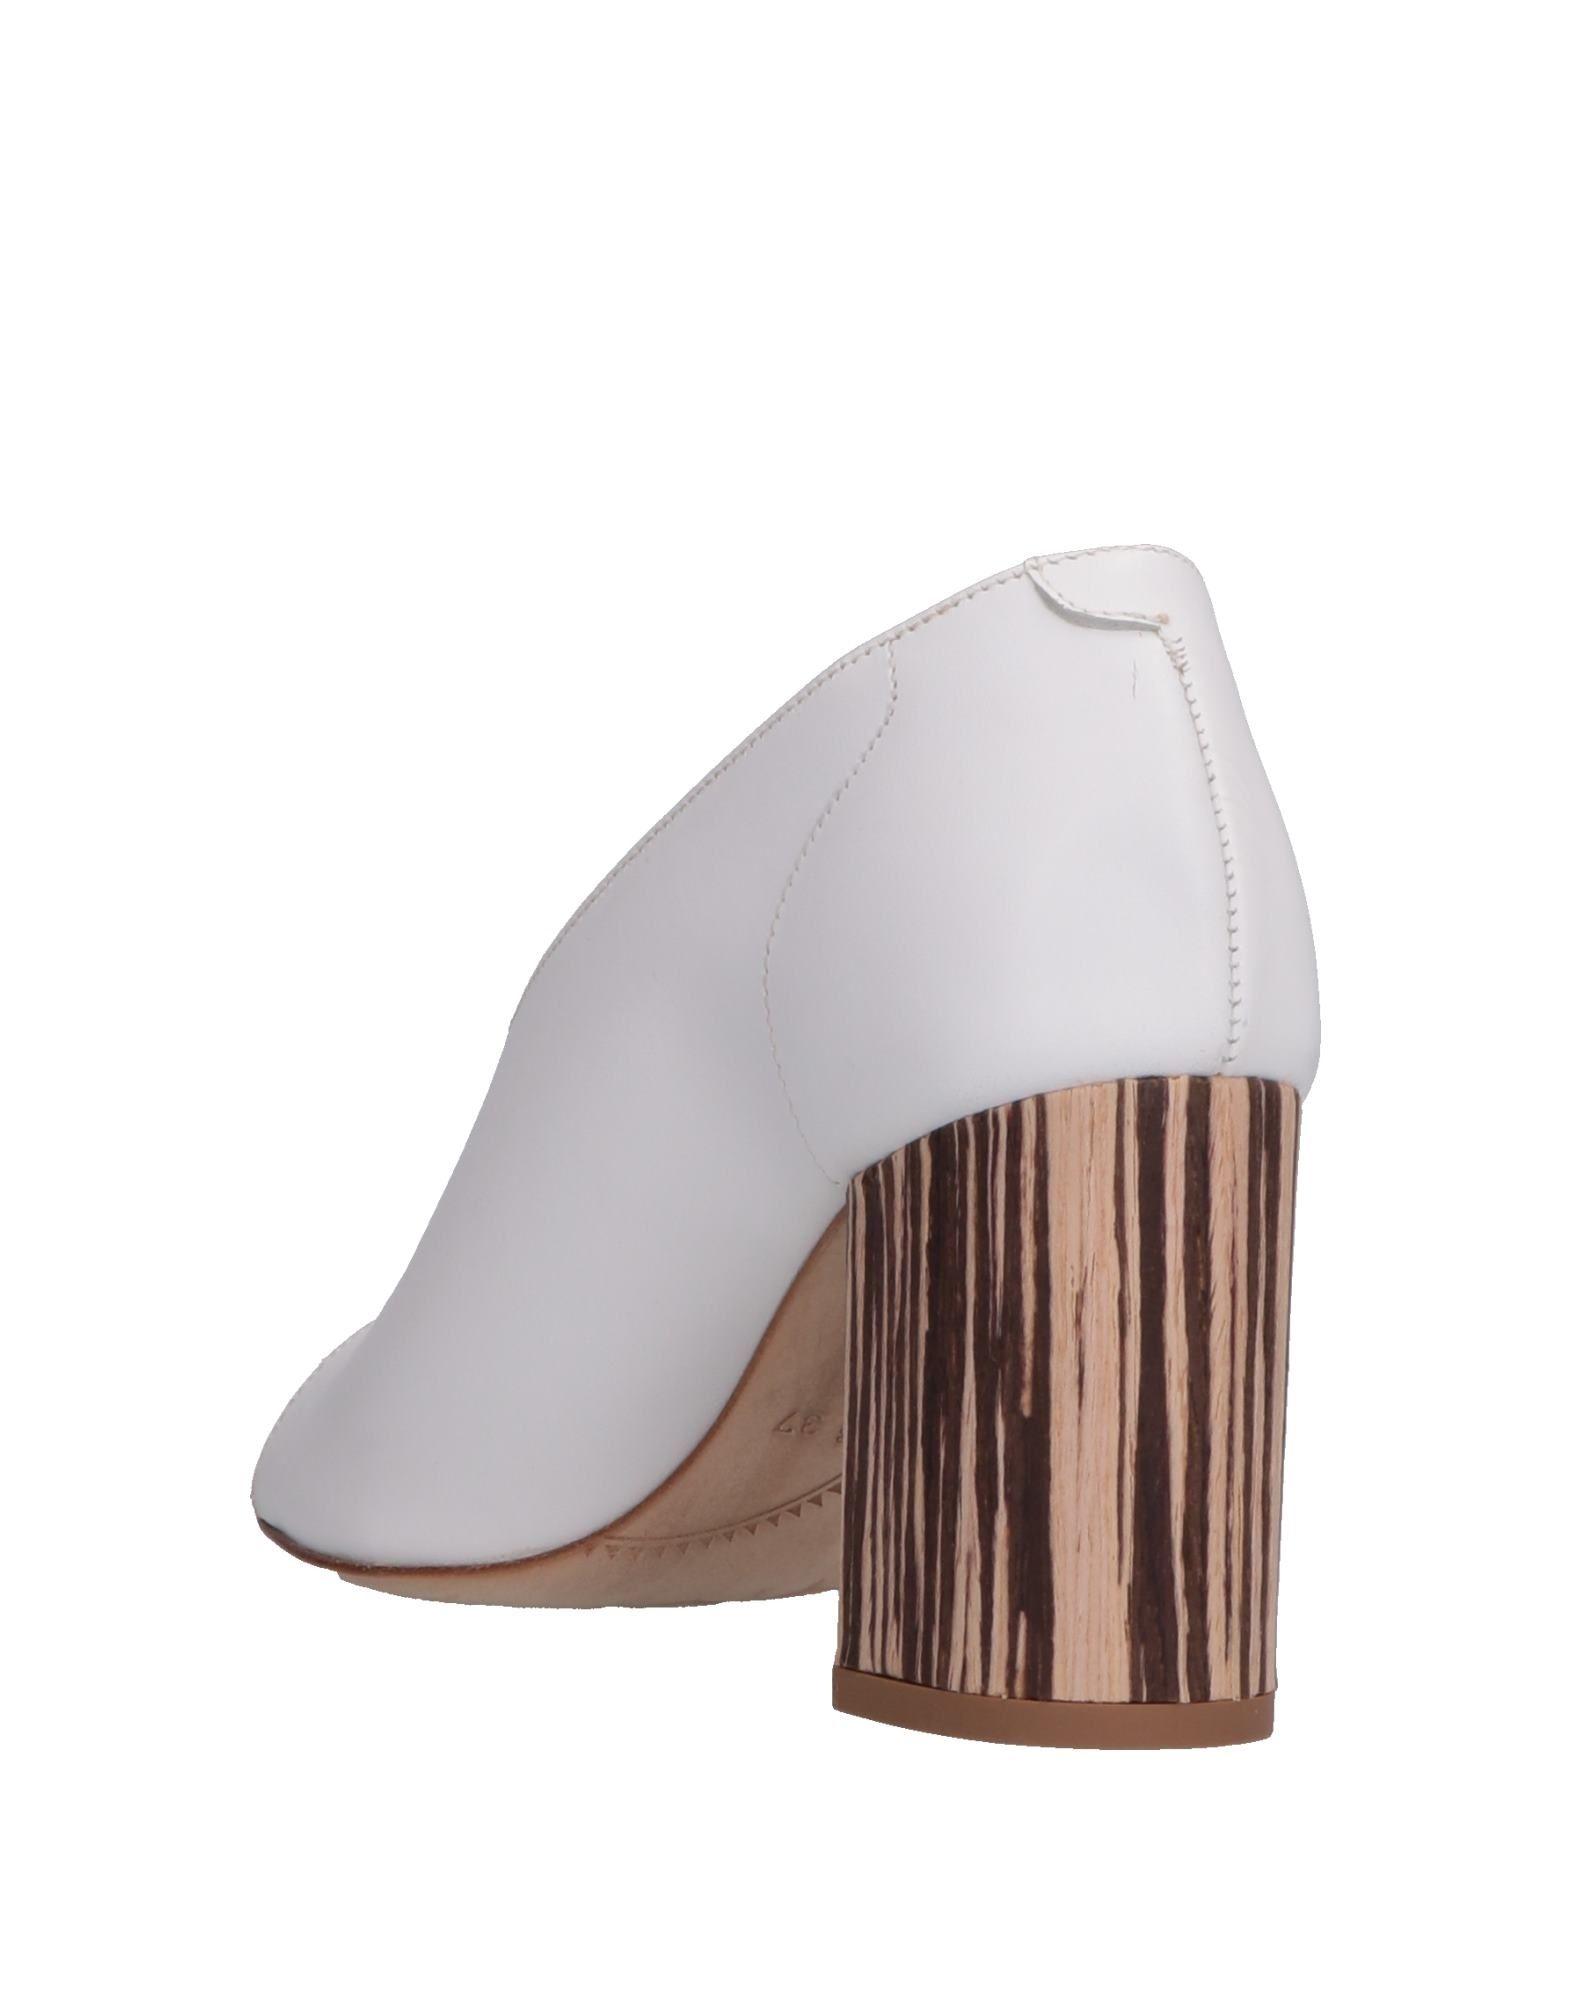 Stilvolle Pumps billige Schuhe Alberto Fermani Pumps Stilvolle Damen  11577100JO 66e904